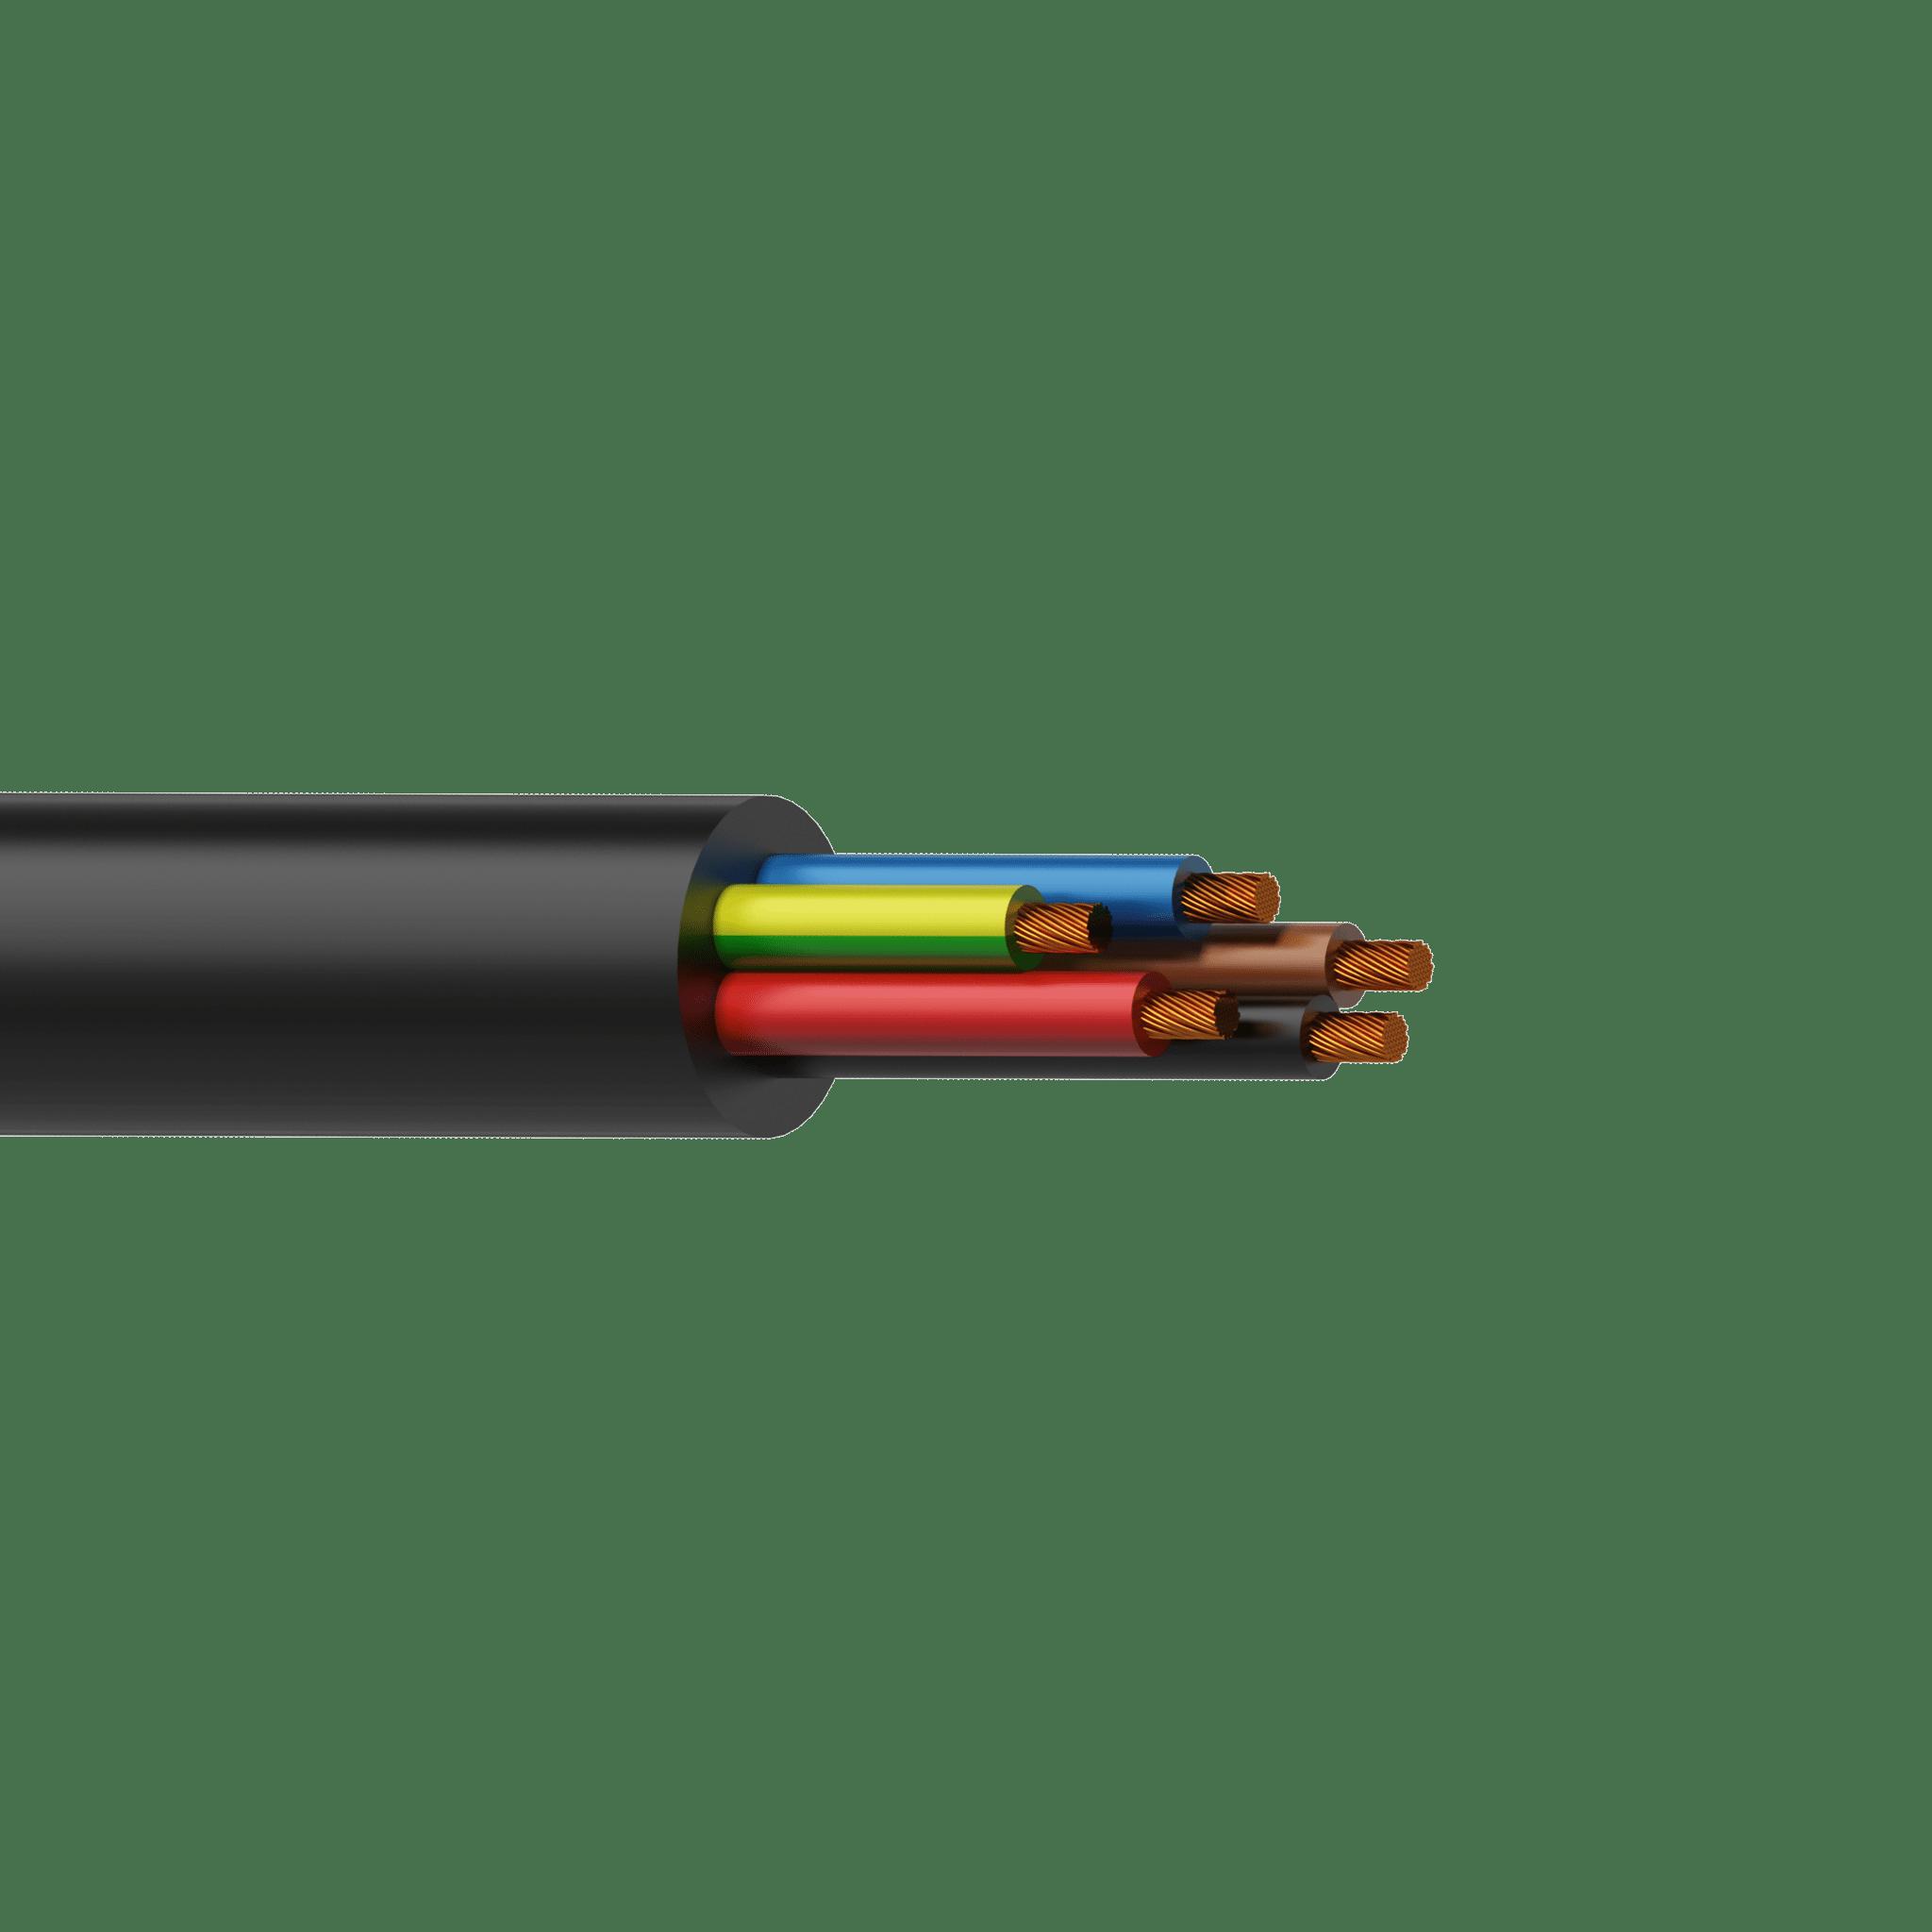 H07RN-F5G2.5 - Power cable - H07RN-F 5G2.5 - 5 x 2.5 mm² - 13 AWG